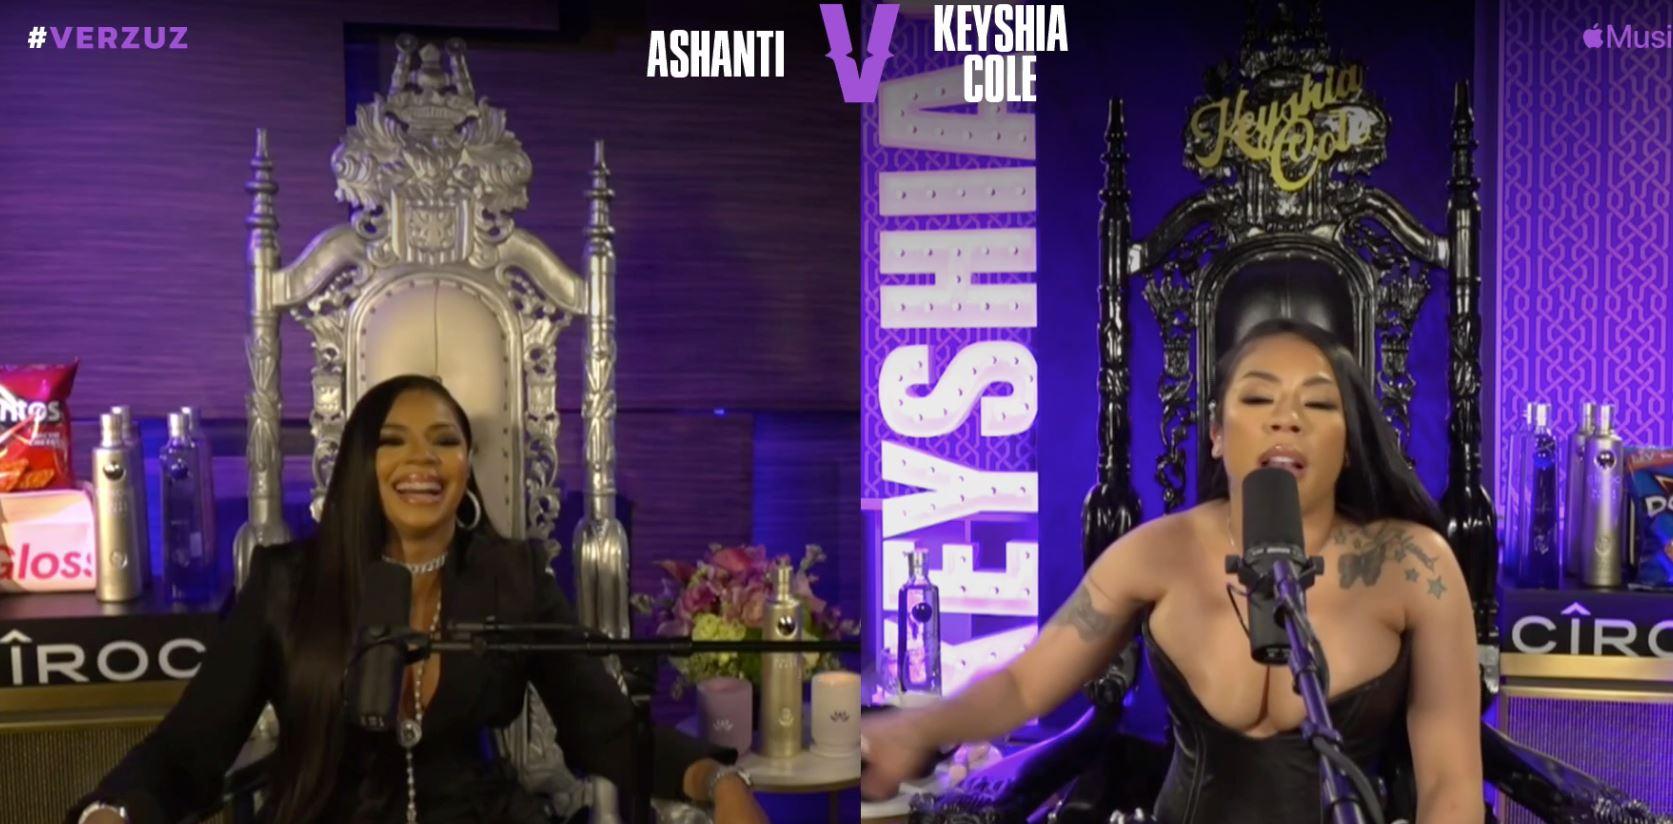 Watch: Ashanti vs Keyshia Cole #VERZUZ Battle [Full ...